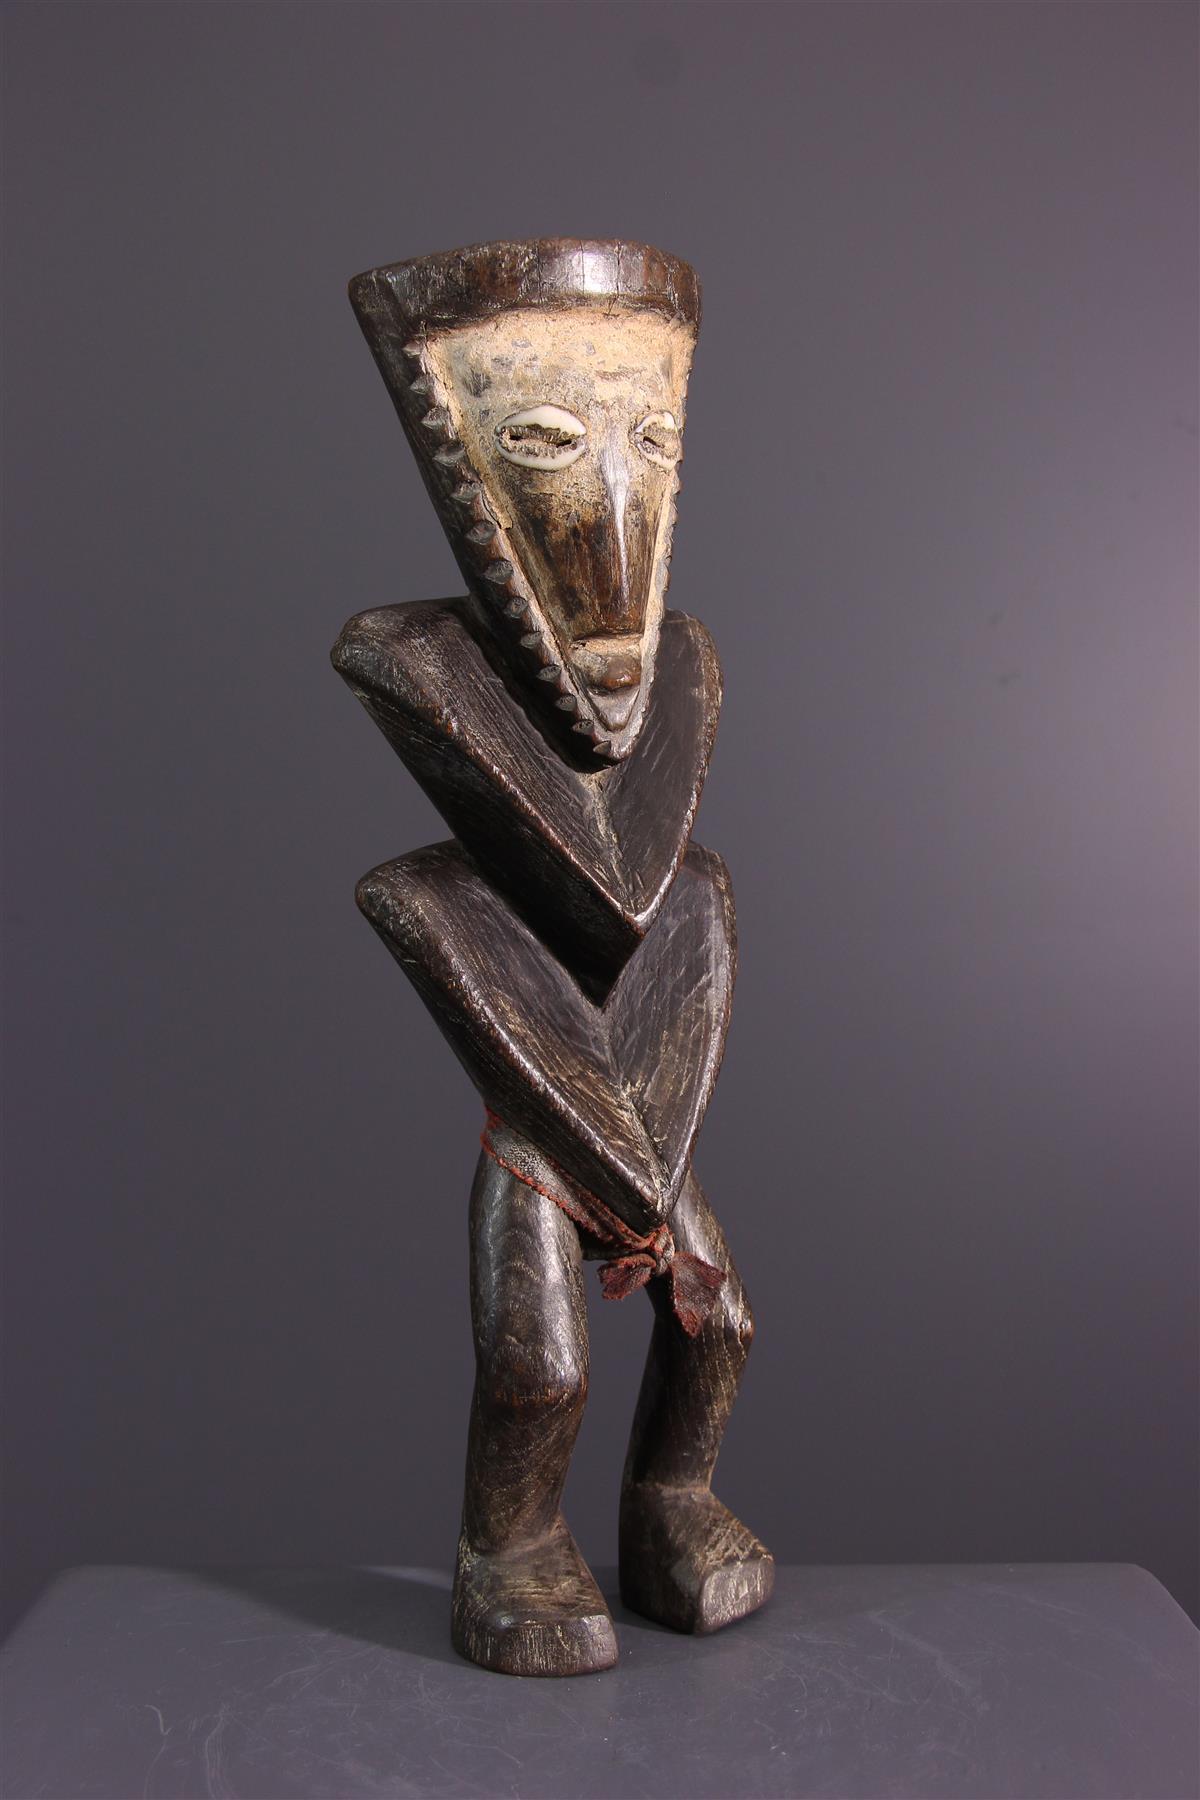 Bassikassingo fetish - African art